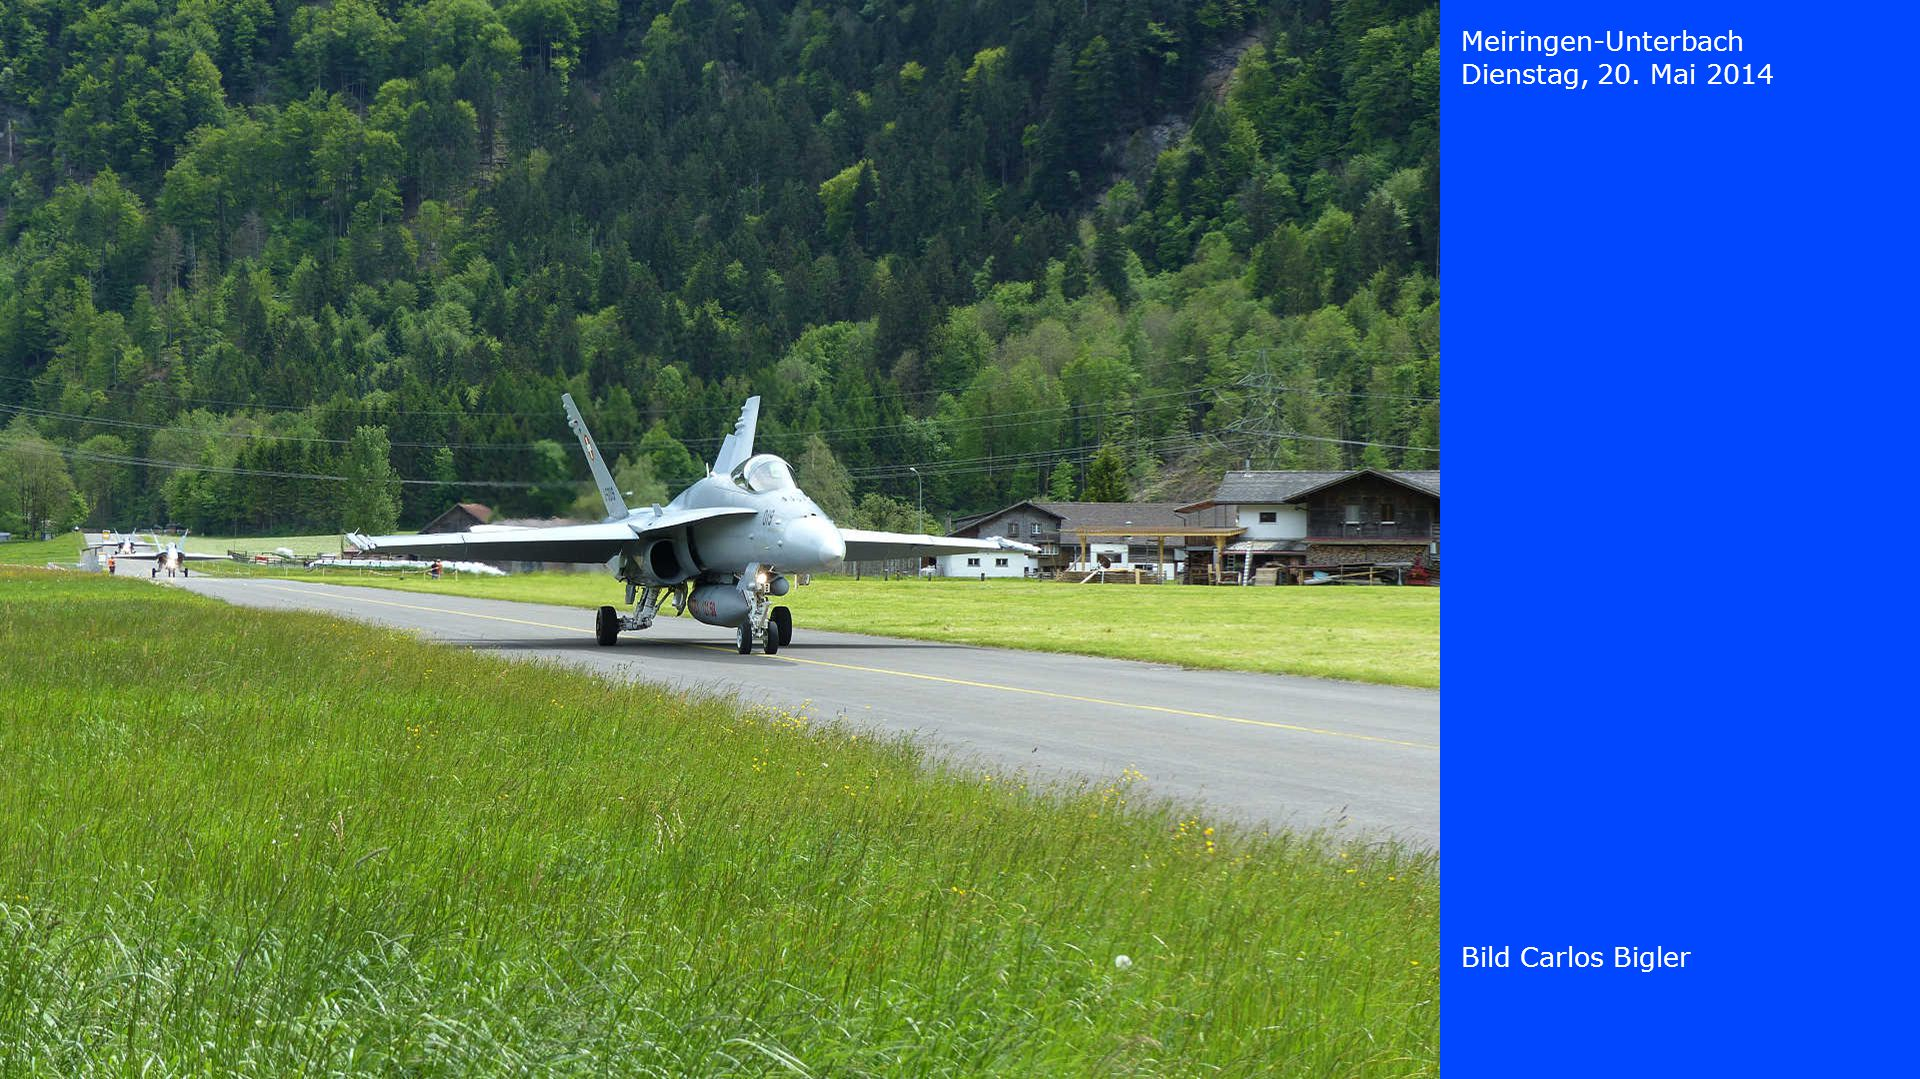 Meiringen-Unterbach Dienstag, 20. Mai 2014 Bild Carlos Bigler